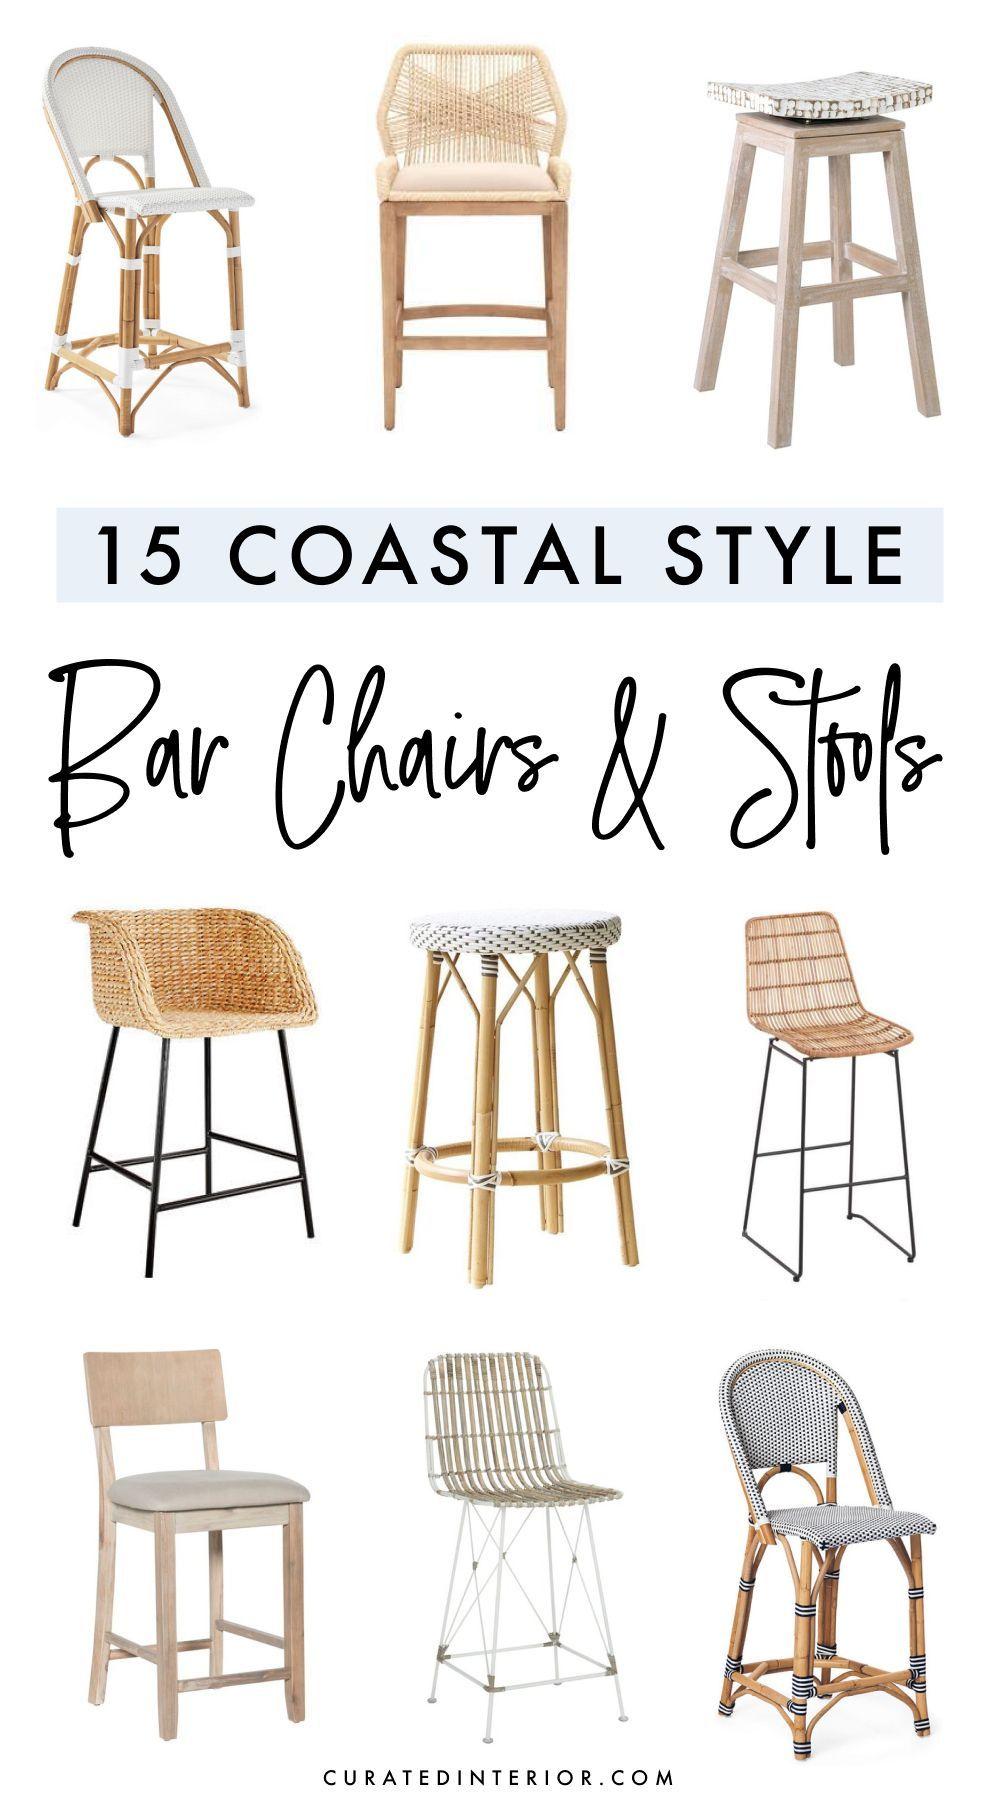 15 Coastal Counter Chairs Bar Stools For Beach Homes Counter Chairs Bar Chairs Bar Stools Kitchen Island